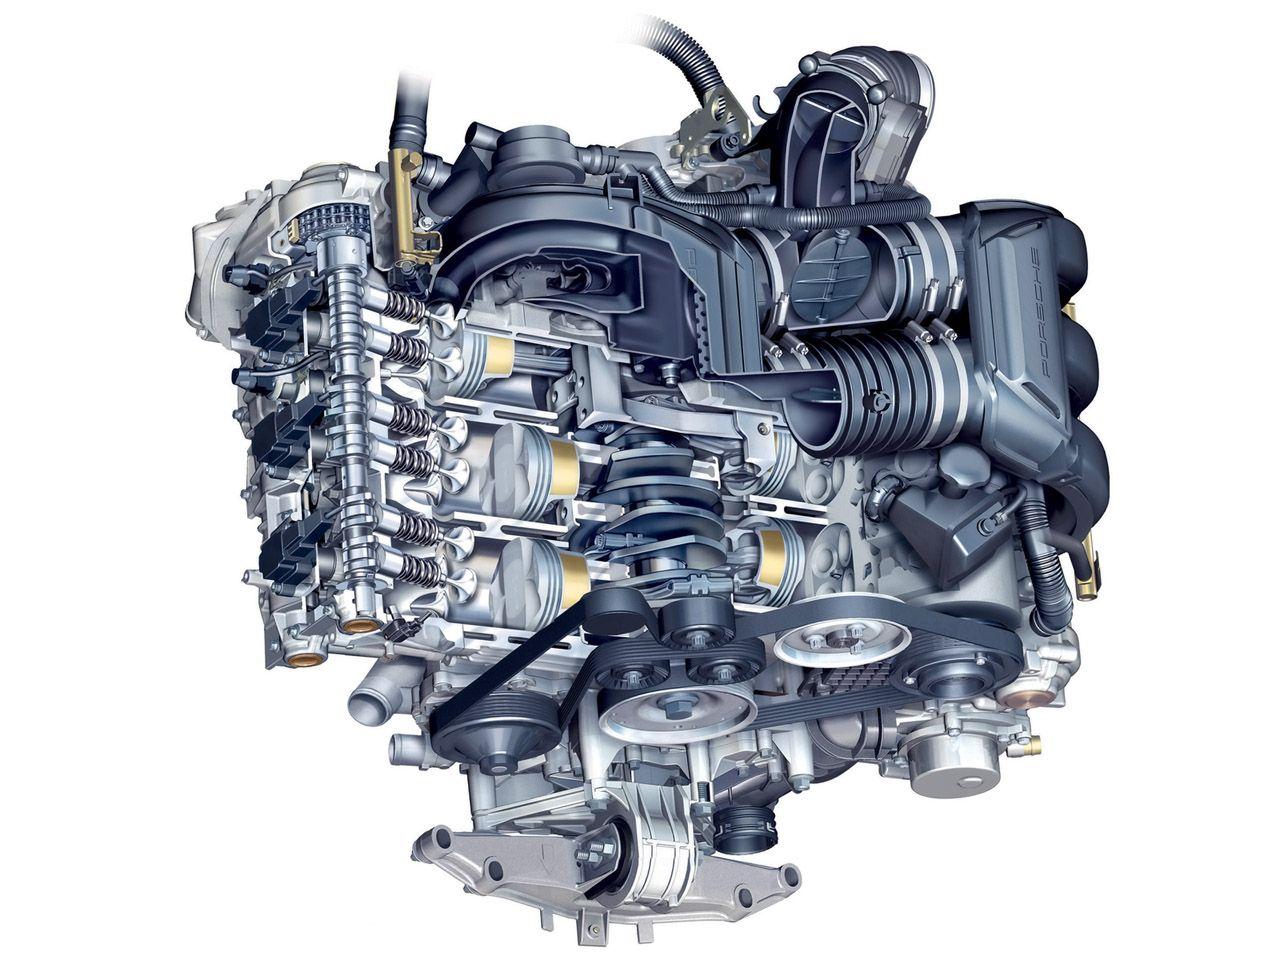 porsche cayman f6 engine porsche pinterest engine cars and rh pinterest com 944 Turbo Engine Diagram Porsche 964 Fuse Box Diagram